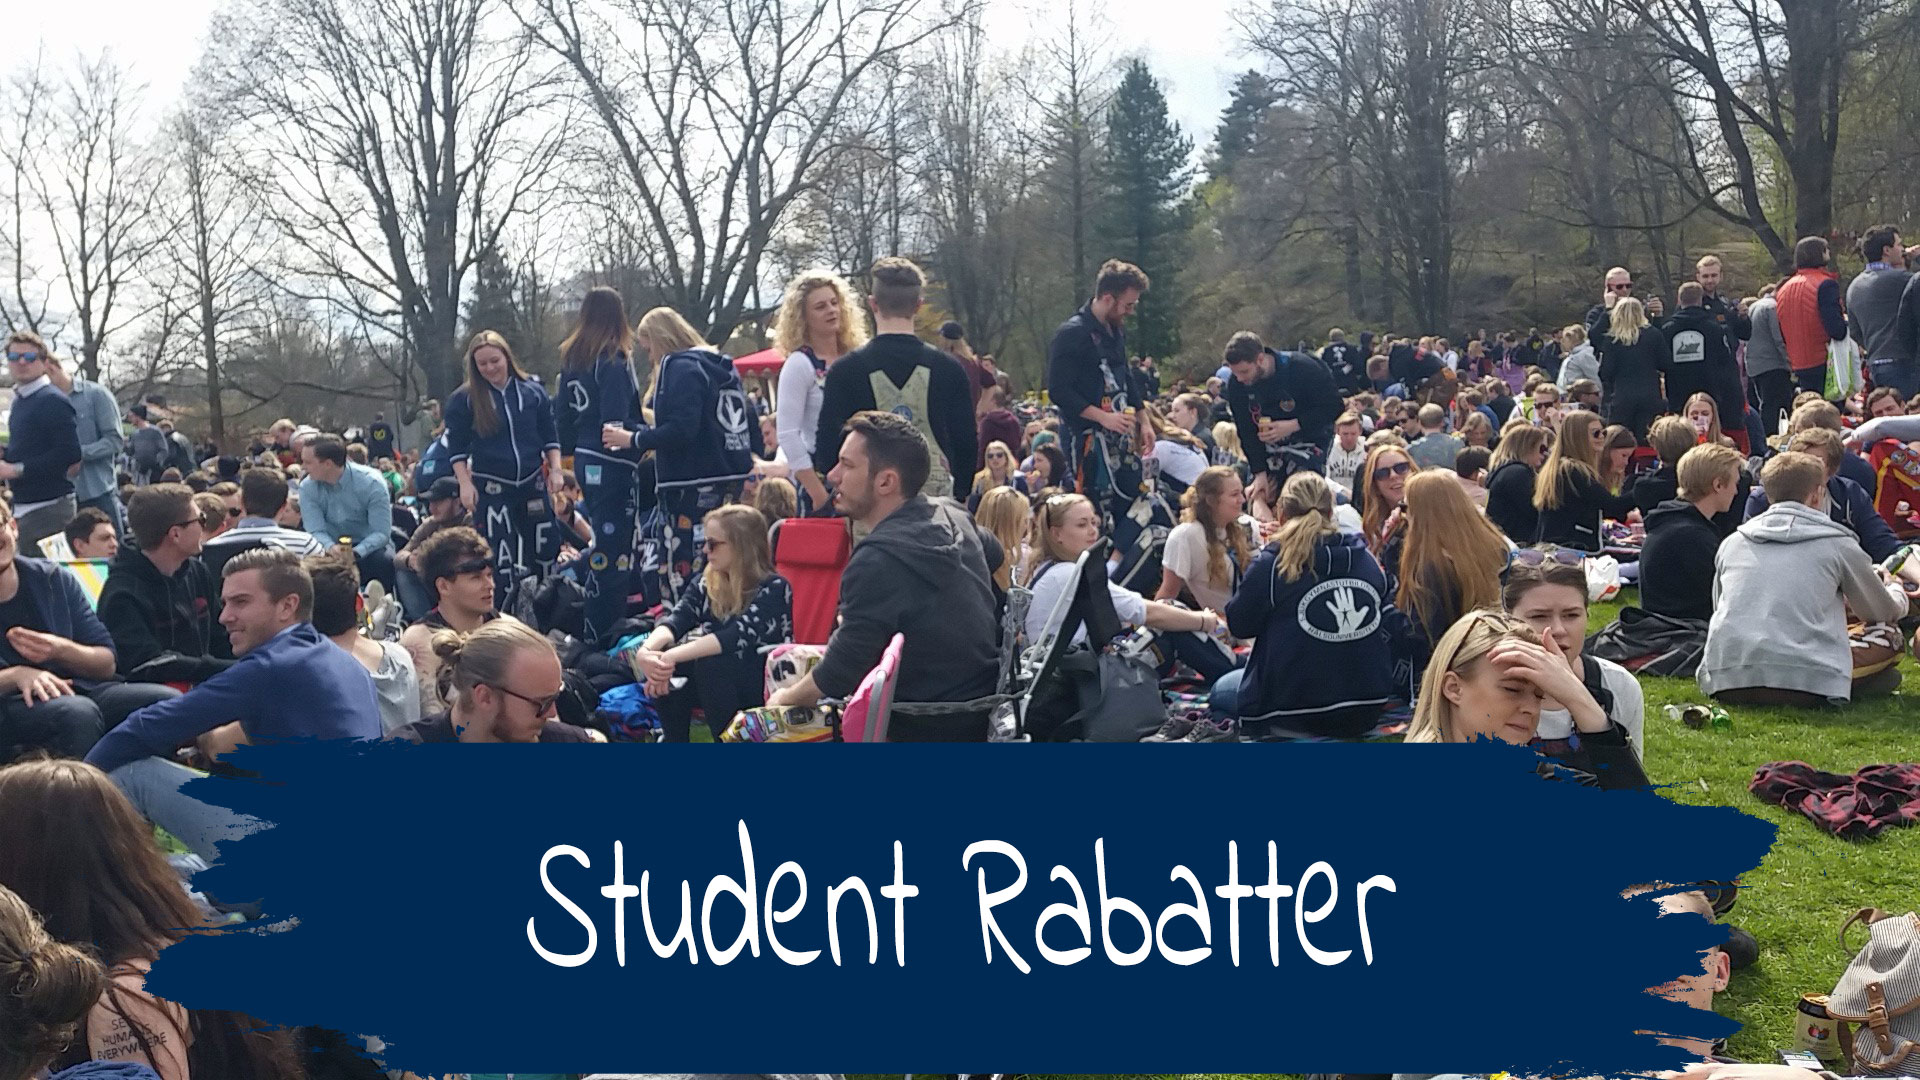 Student Rabatter